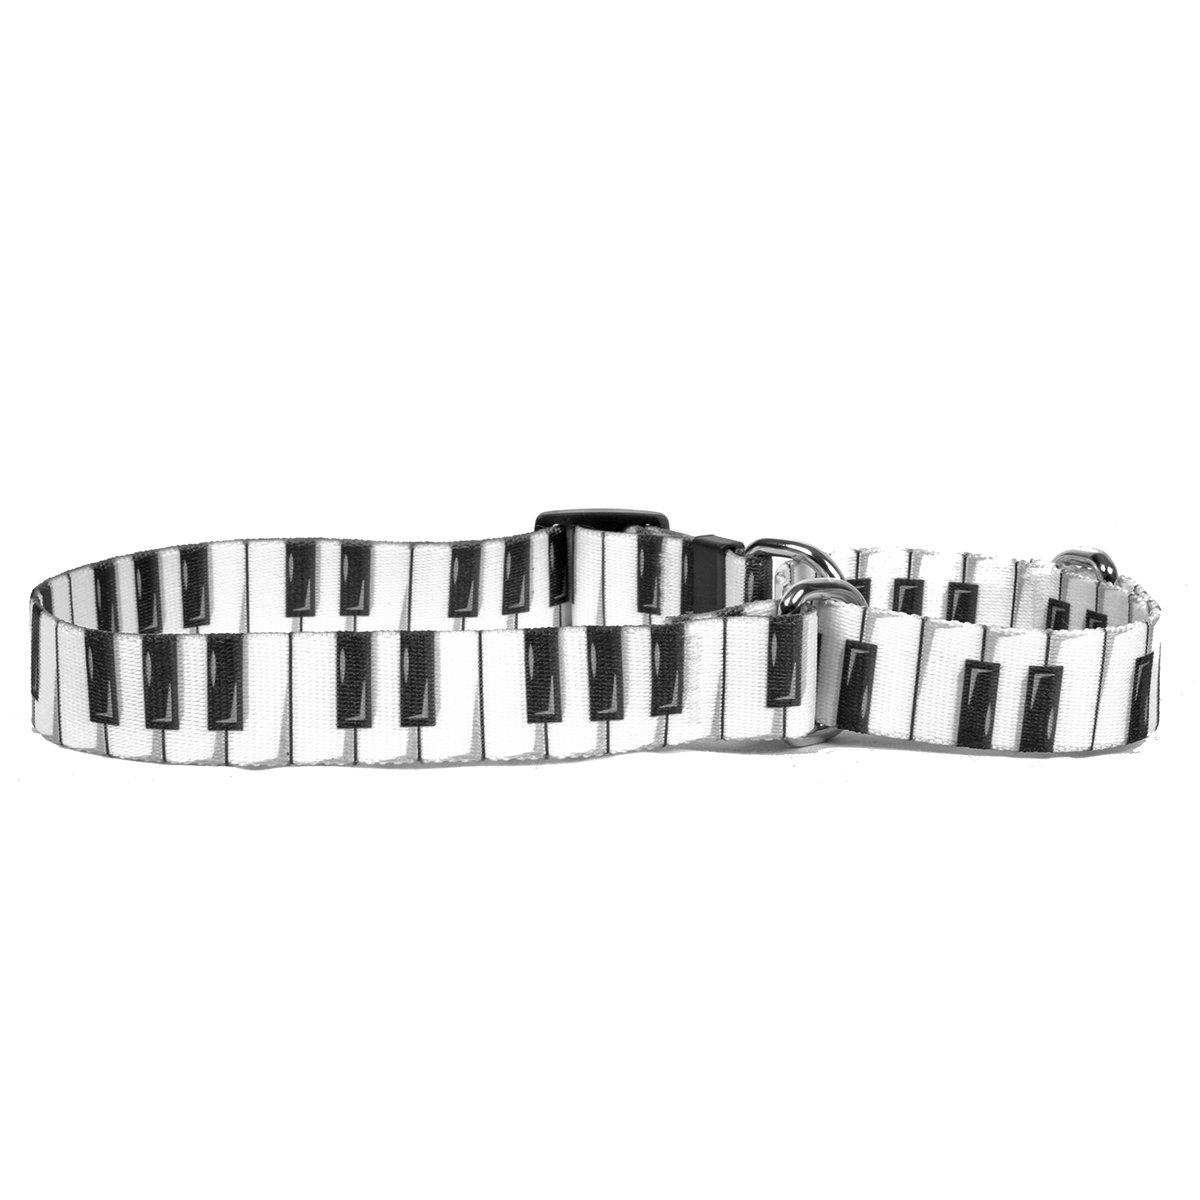 Medium 20\ Yellow Dog Design Piano Keys Martingale Dog Collar, Medium-1  Wide and fits neck sizes 14 to 20